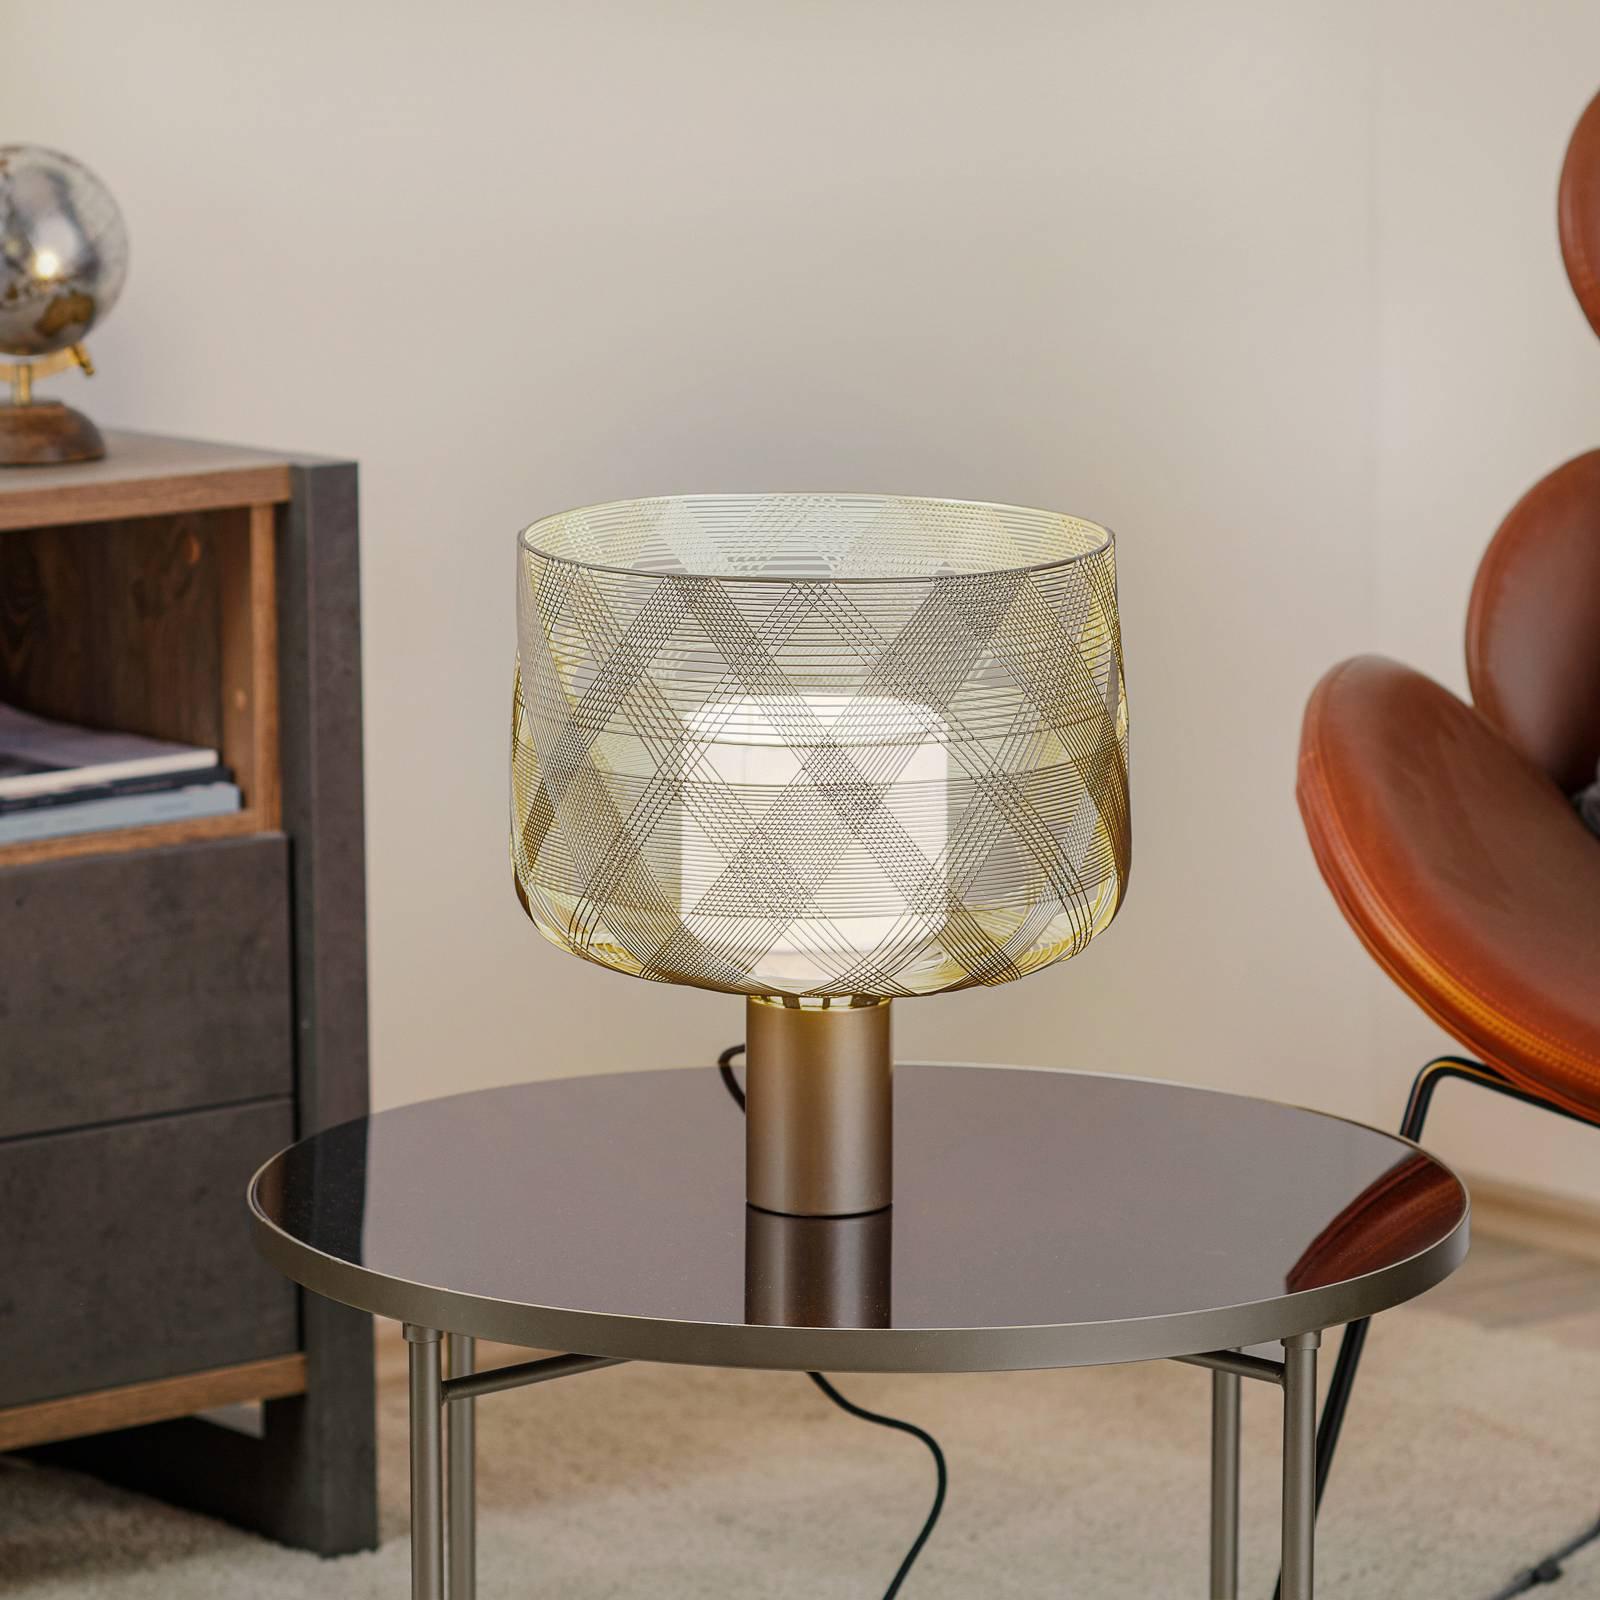 Forestier Antenna M bordlampe, 29cm, metallisk grå